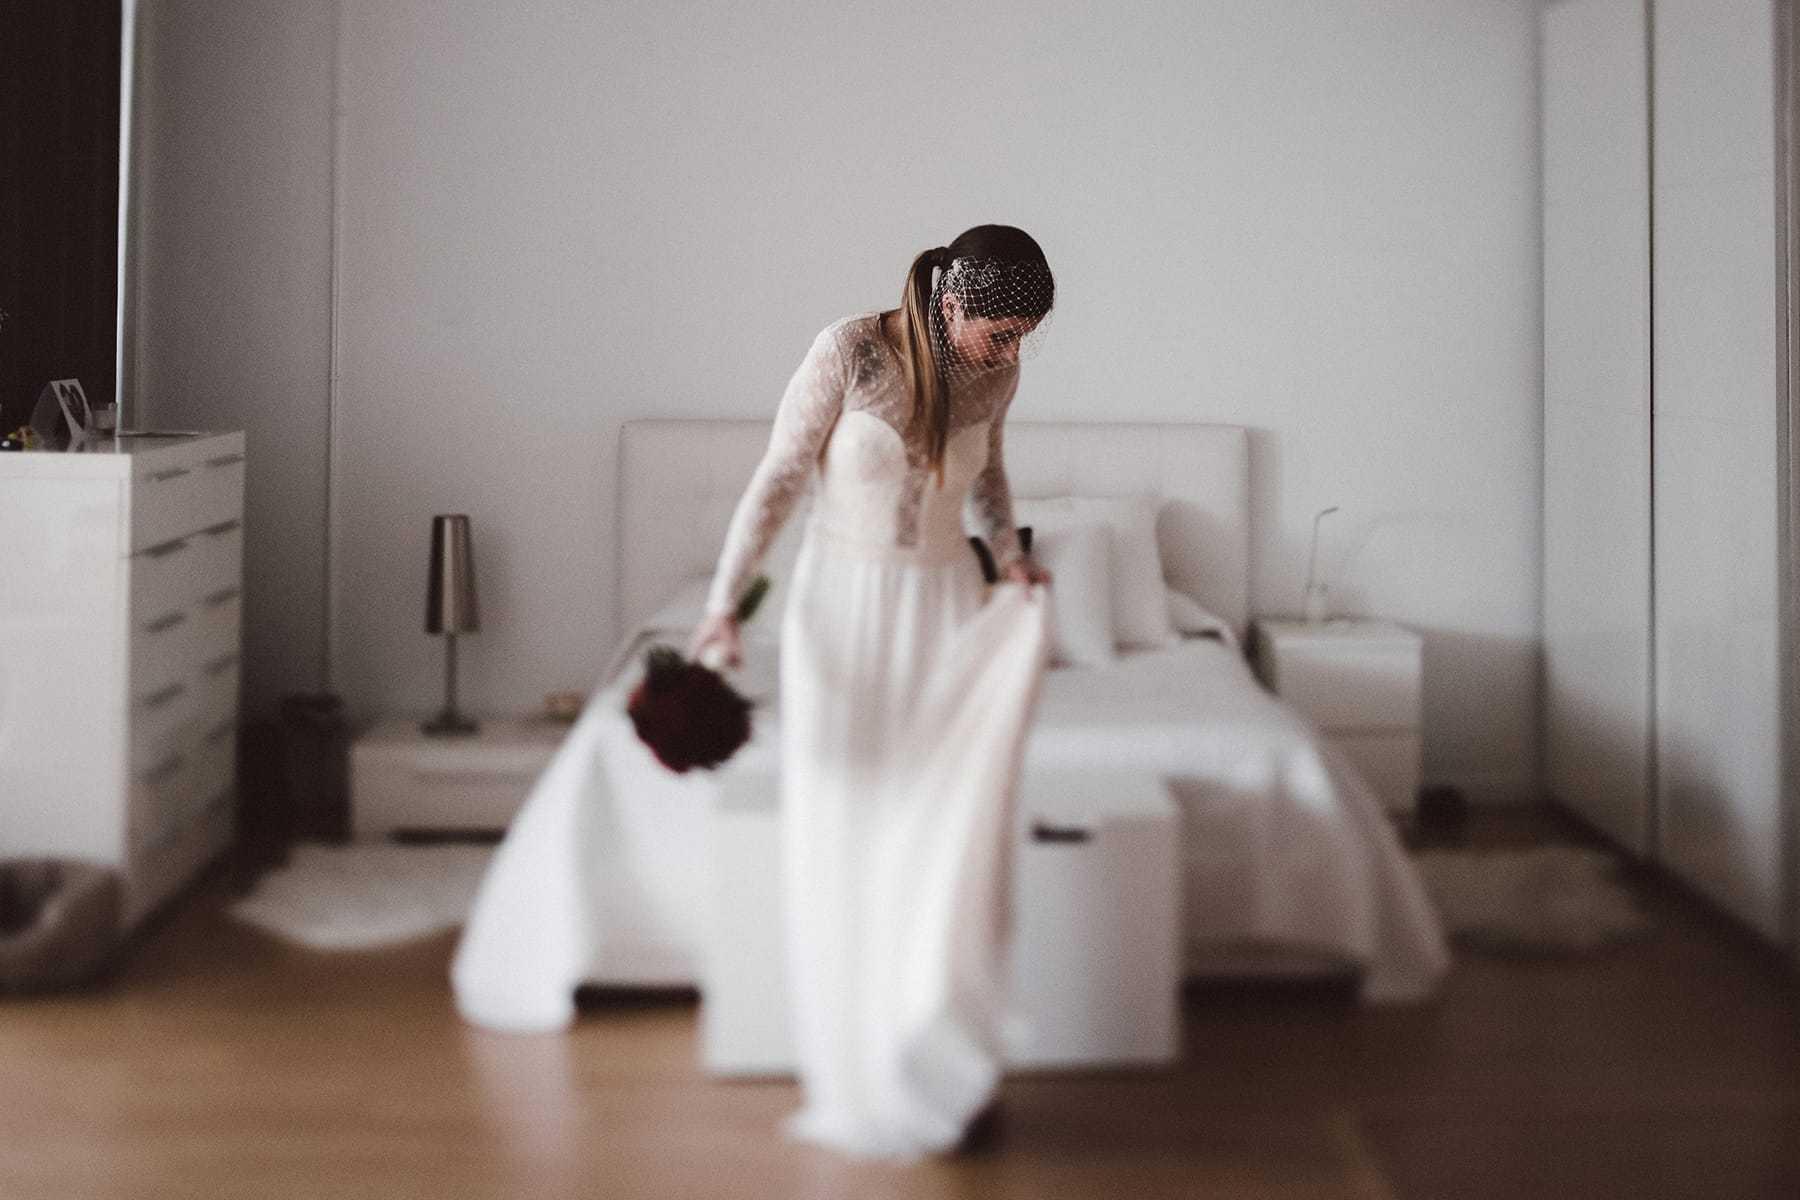 vestido_de_novia_otaduy_hilario_sanchez_fotografo_boda_barcelona_038